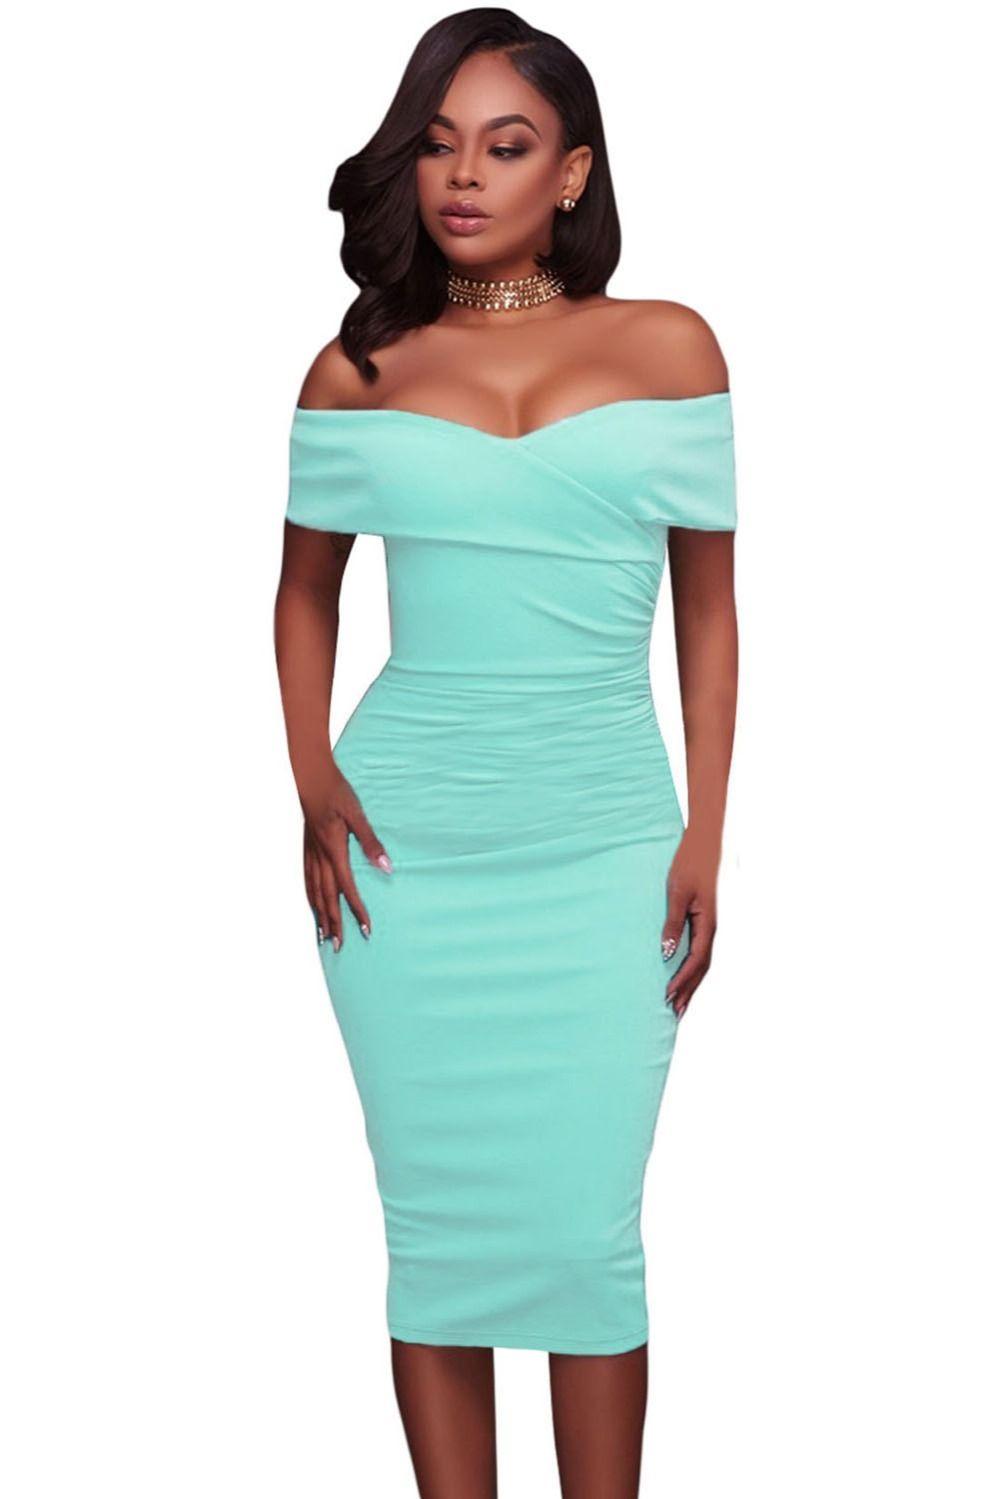 34a8453bef02a9 $37.4 - Cool Dear Lover Off Shoulder Summer Dress 2017 Clothes Women Cyan Ruched  Short Sleeve Bodycon Midi Sheath Dress Vestidos Mujer C61507 - Buy it Now!